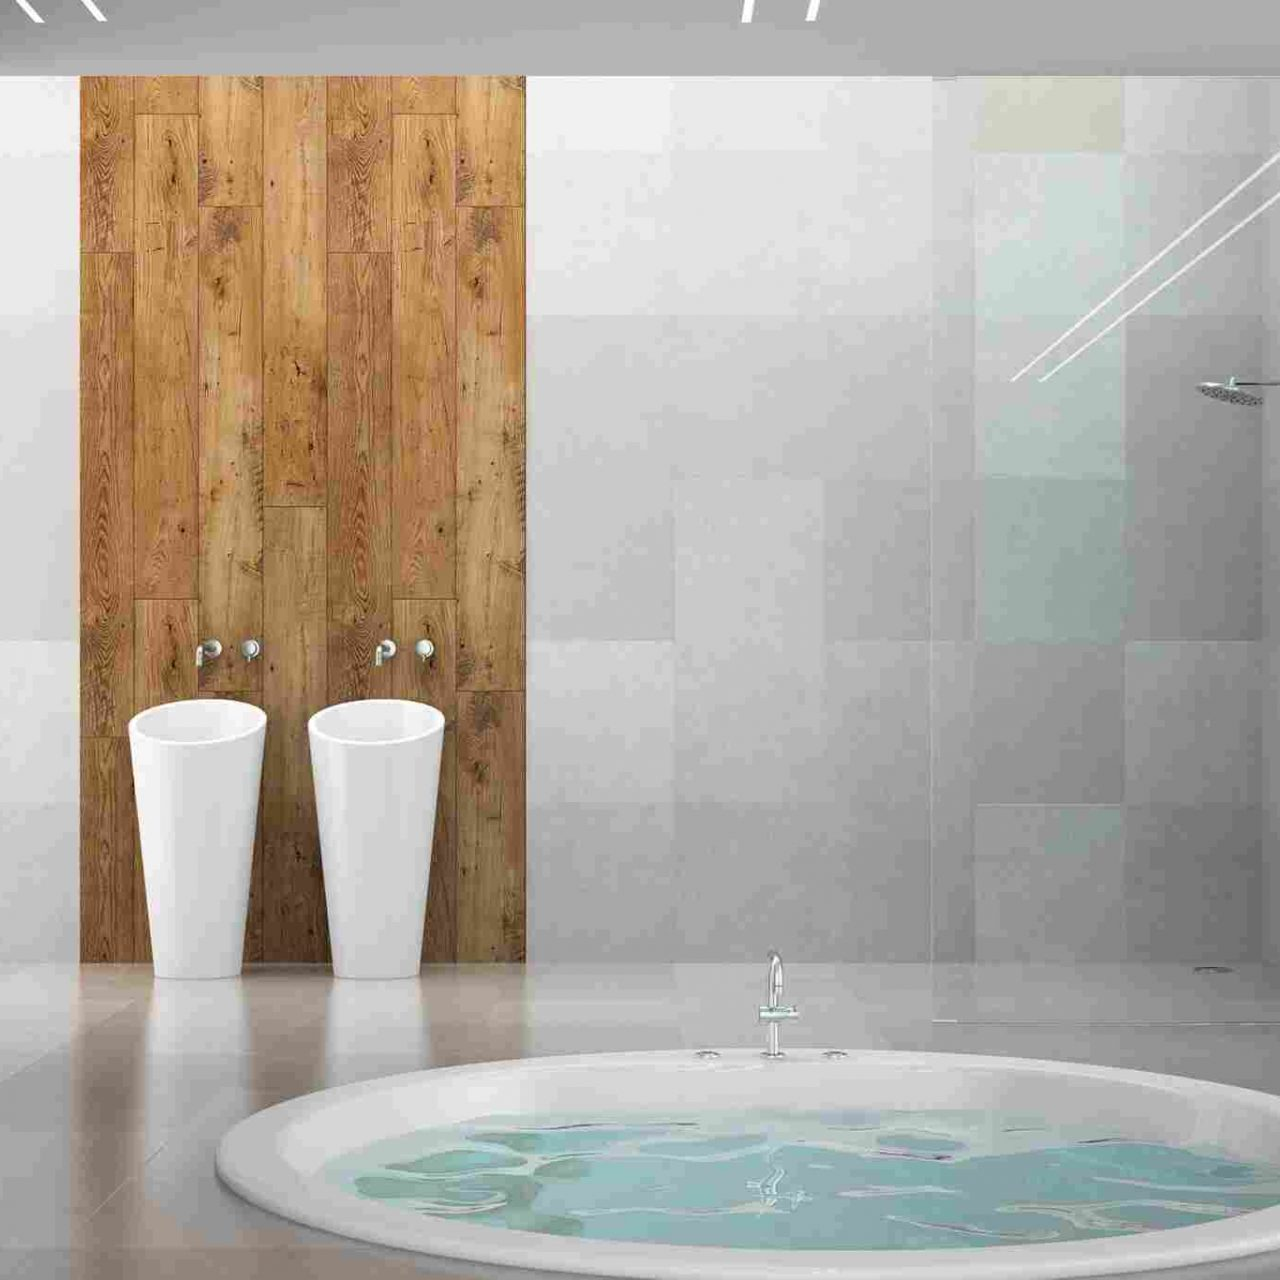 Bathroom design ideas – Calore Zen